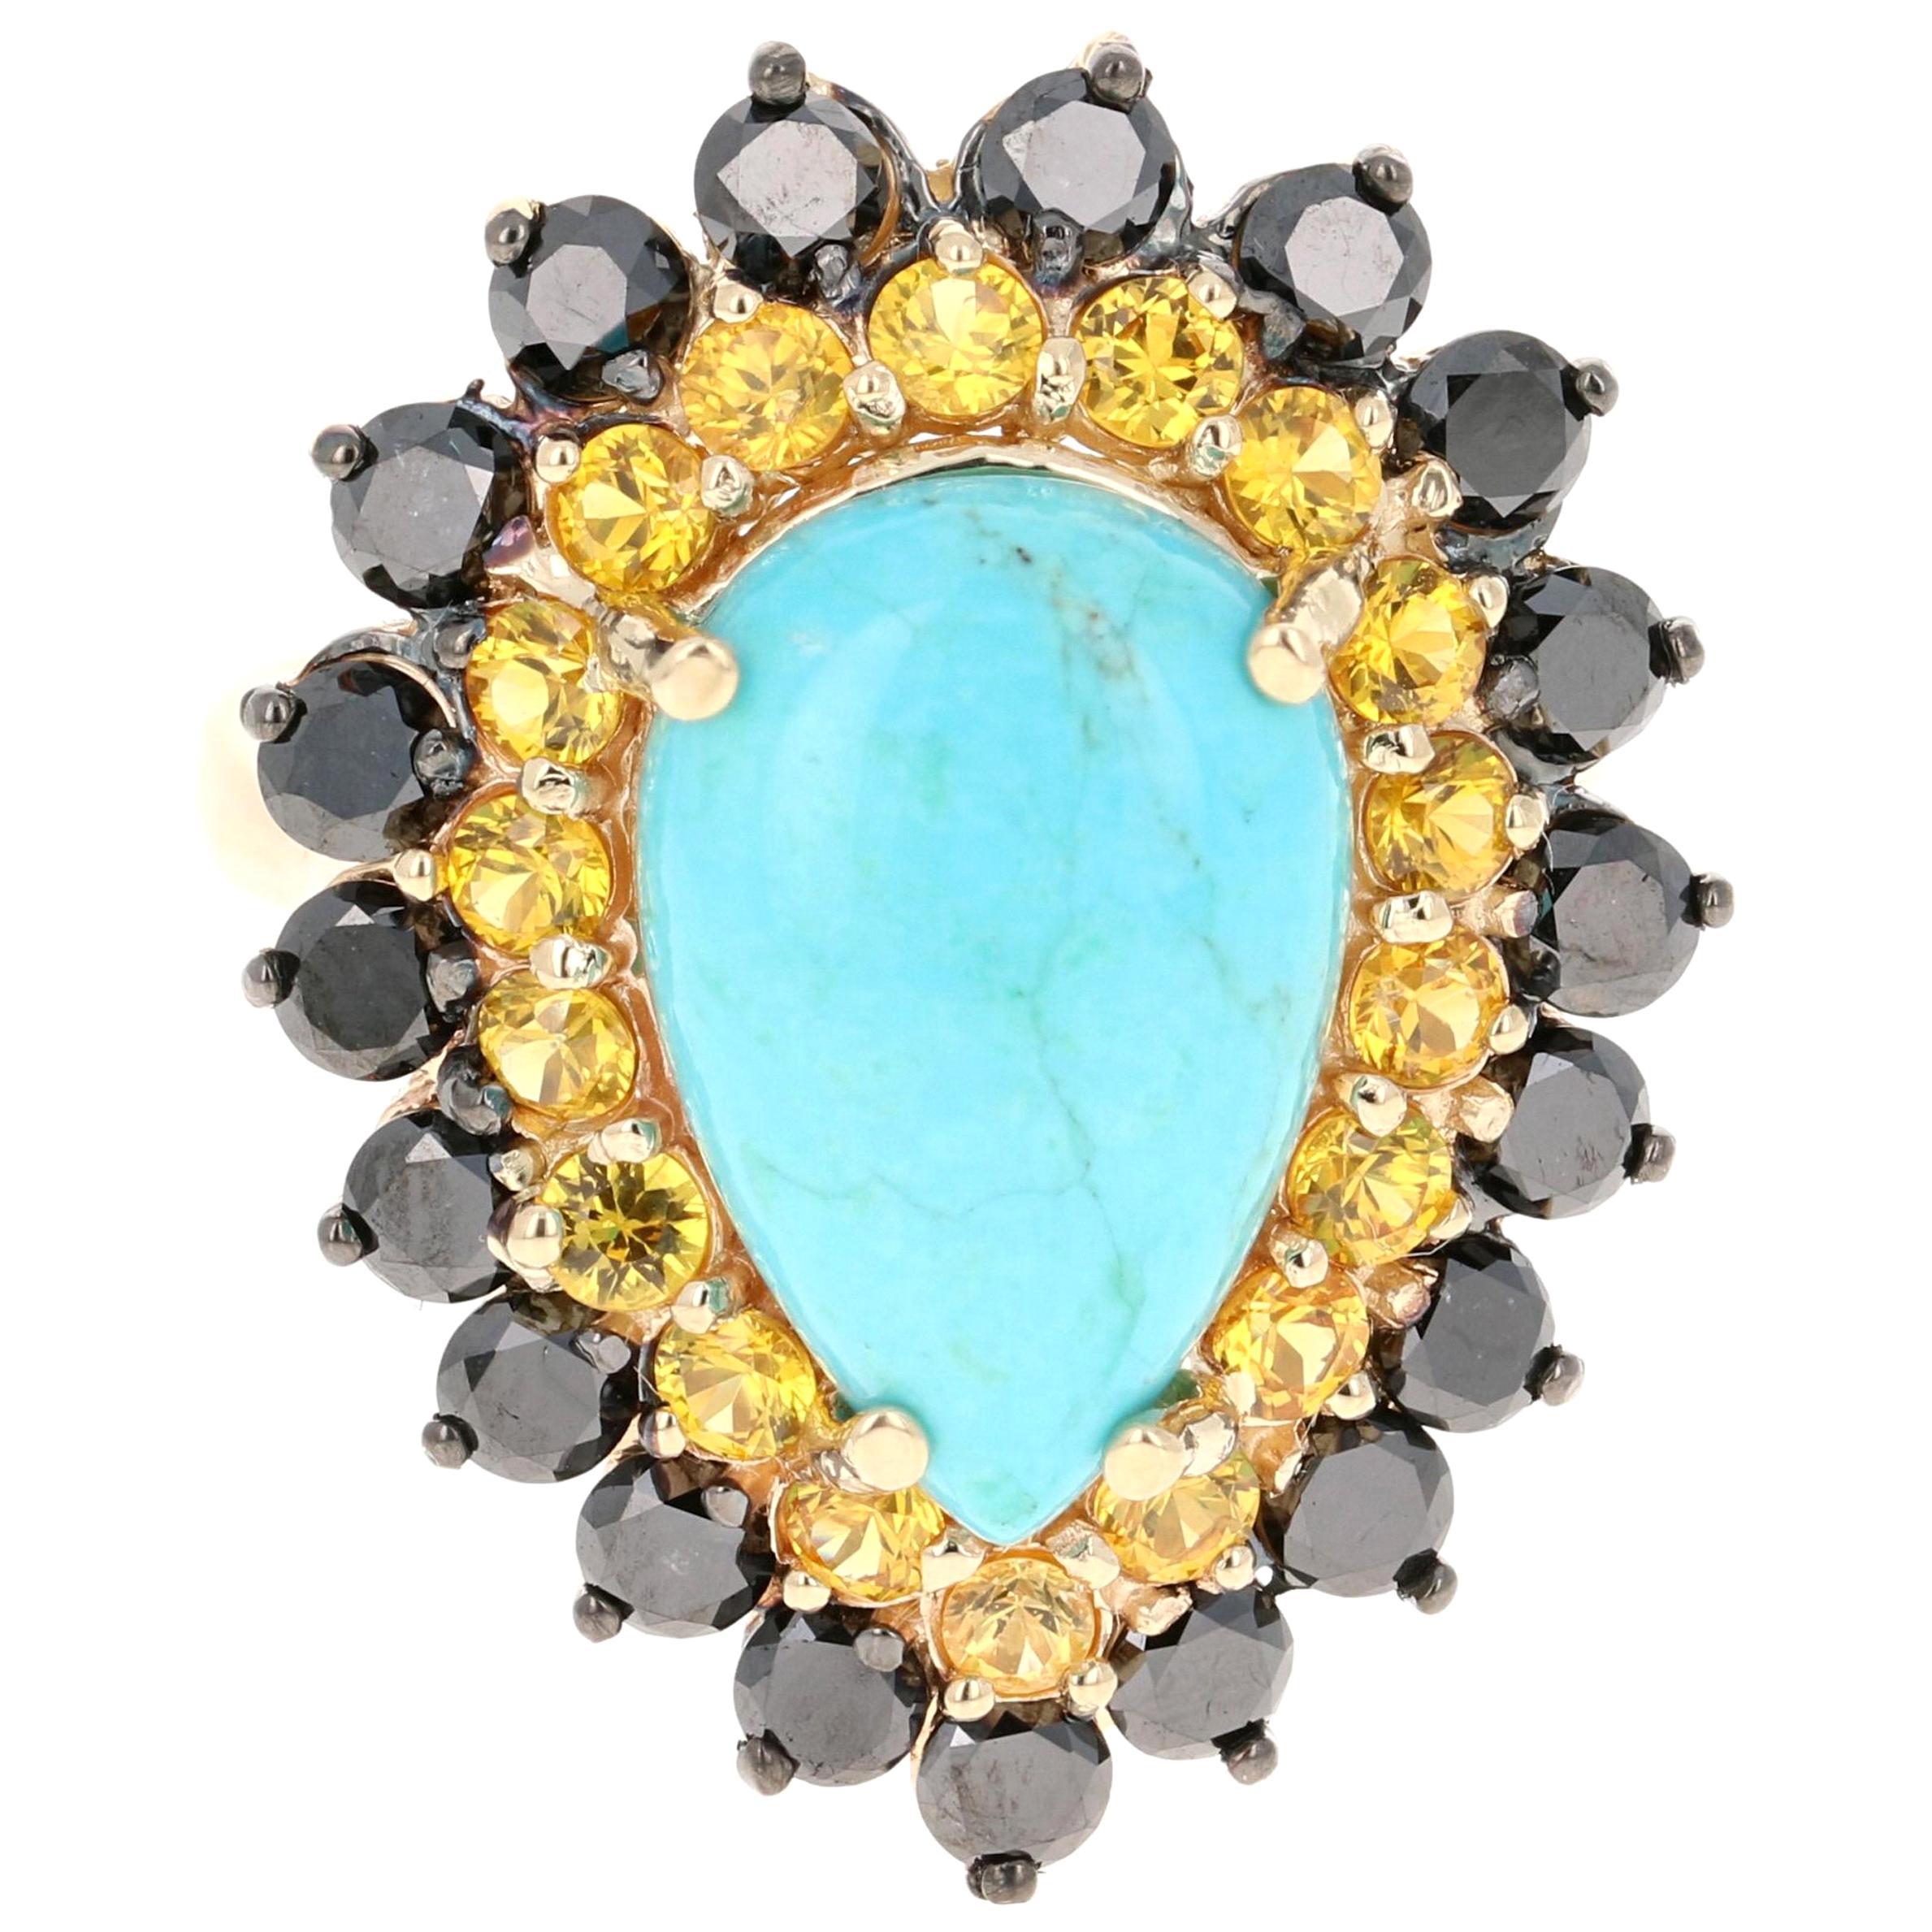 7.35 Carat Pear Cut Turquoise Sapphire Diamond 14 Karat Gold Cocktail Ring